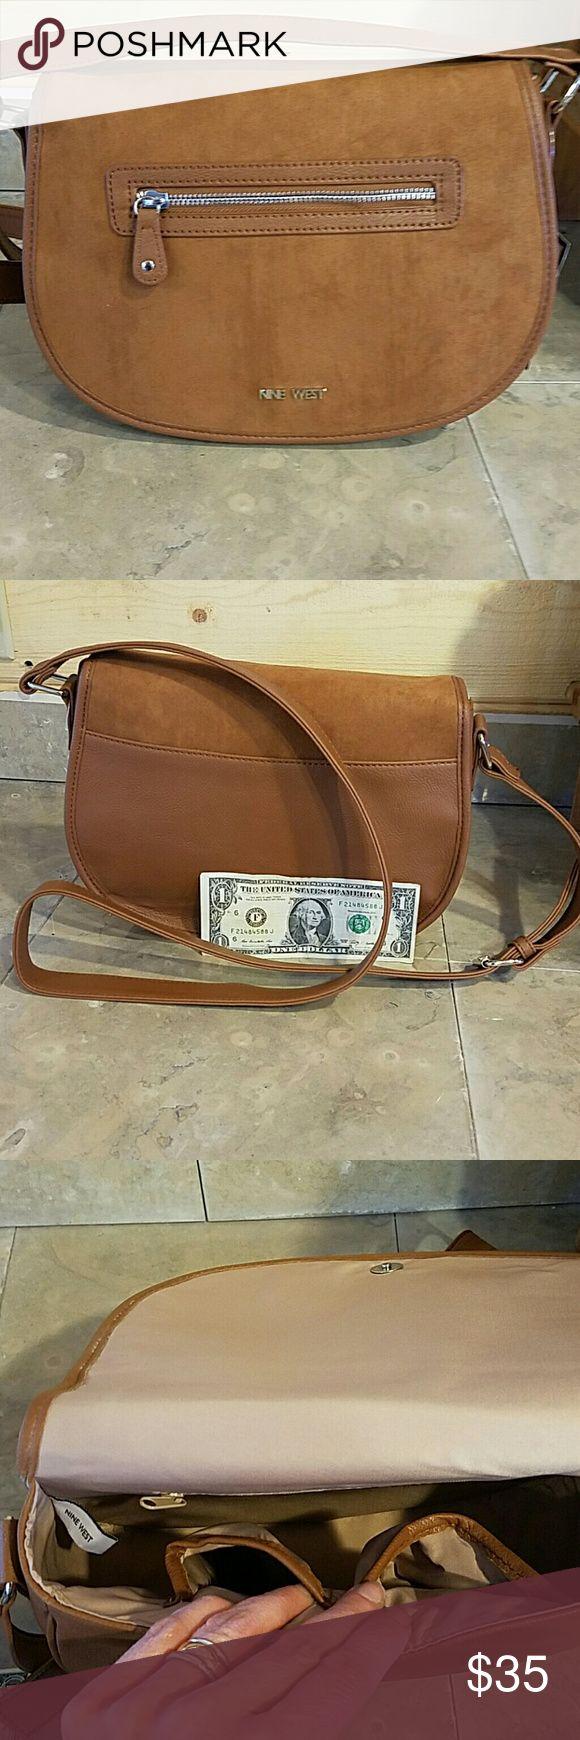 Nine West saddle bag purse Classic Brown saddle bag style Nine West Purse Nine West Bags Crossbody Bags